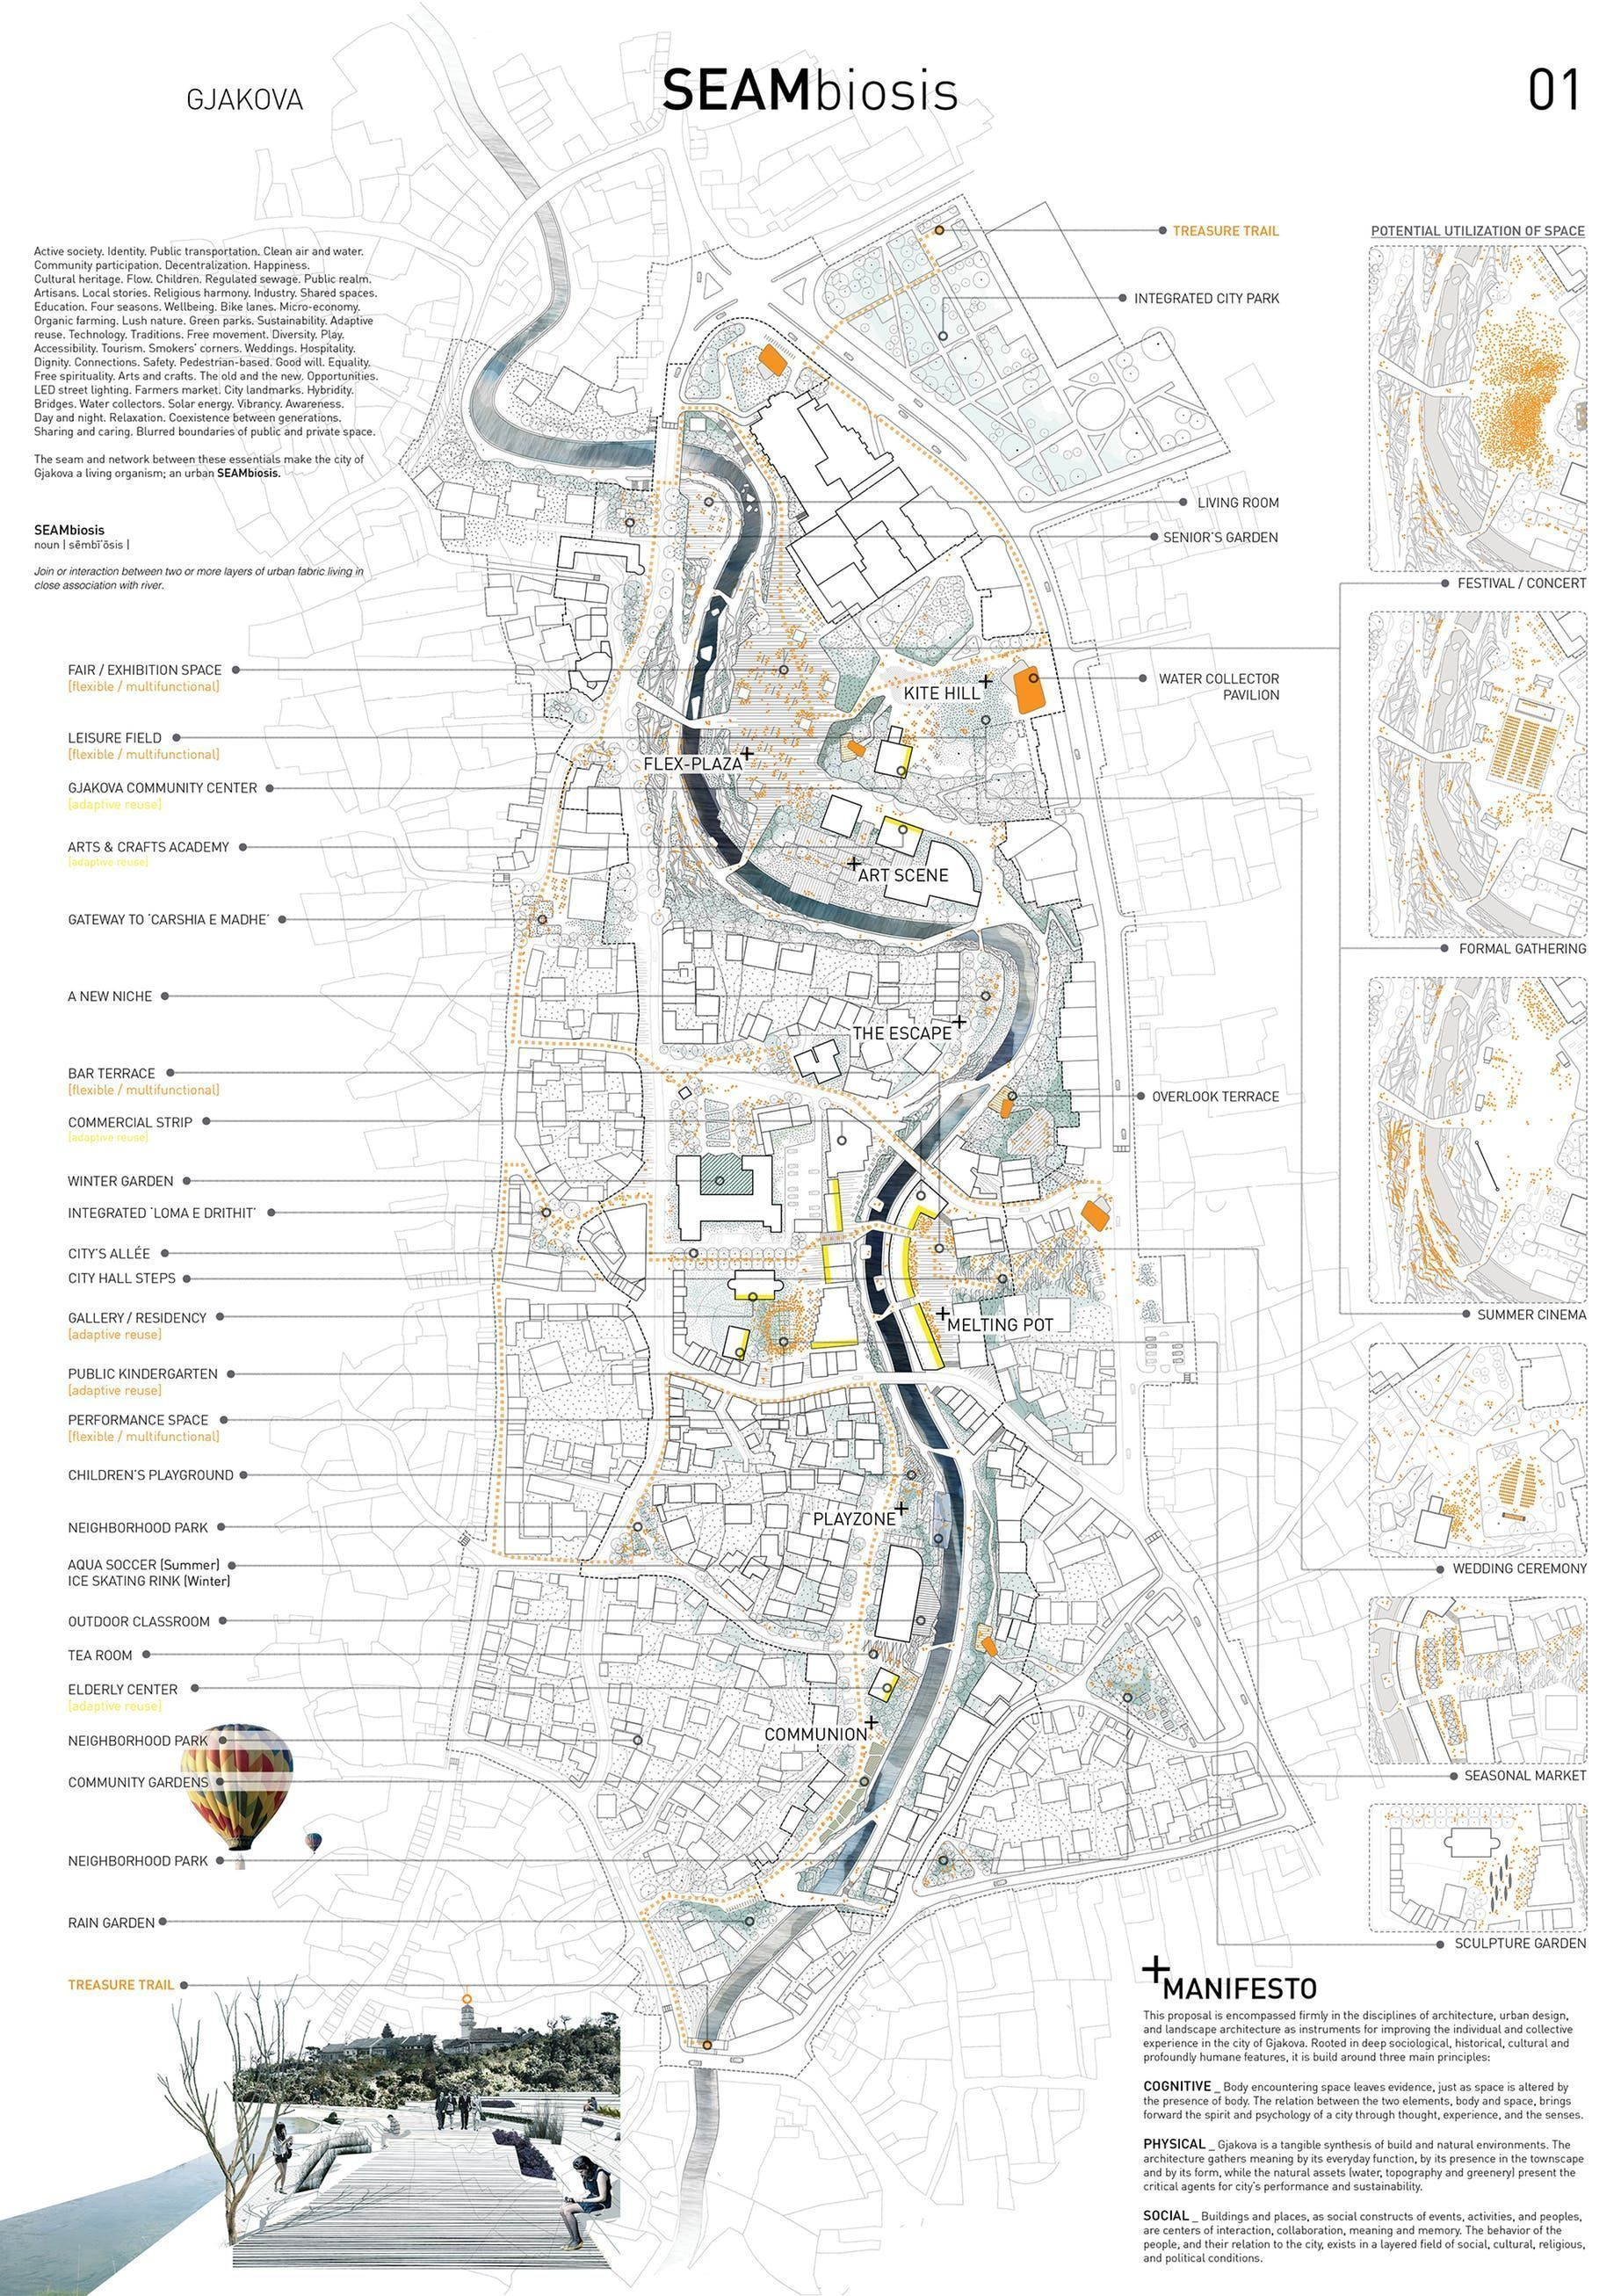 Winning Entry | Europan 13: The Adaptable City II - Gjakova, Kosovo #UrbanDesignplan #urbaneanalyse Winning Entry | Europan 13: The Adaptable City II - Gjakova, Kosovo #UrbanDesignplan #urbaneanalyse Winning Entry | Europan 13: The Adaptable City II - Gjakova, Kosovo #UrbanDesignplan #urbaneanalyse Winning Entry | Europan 13: The Adaptable City II - Gjakova, Kosovo #UrbanDesignplan #urbaneanalyse Winning Entry | Europan 13: The Adaptable City II - Gjakova, Kosovo #UrbanDesign #urbaneanalyse